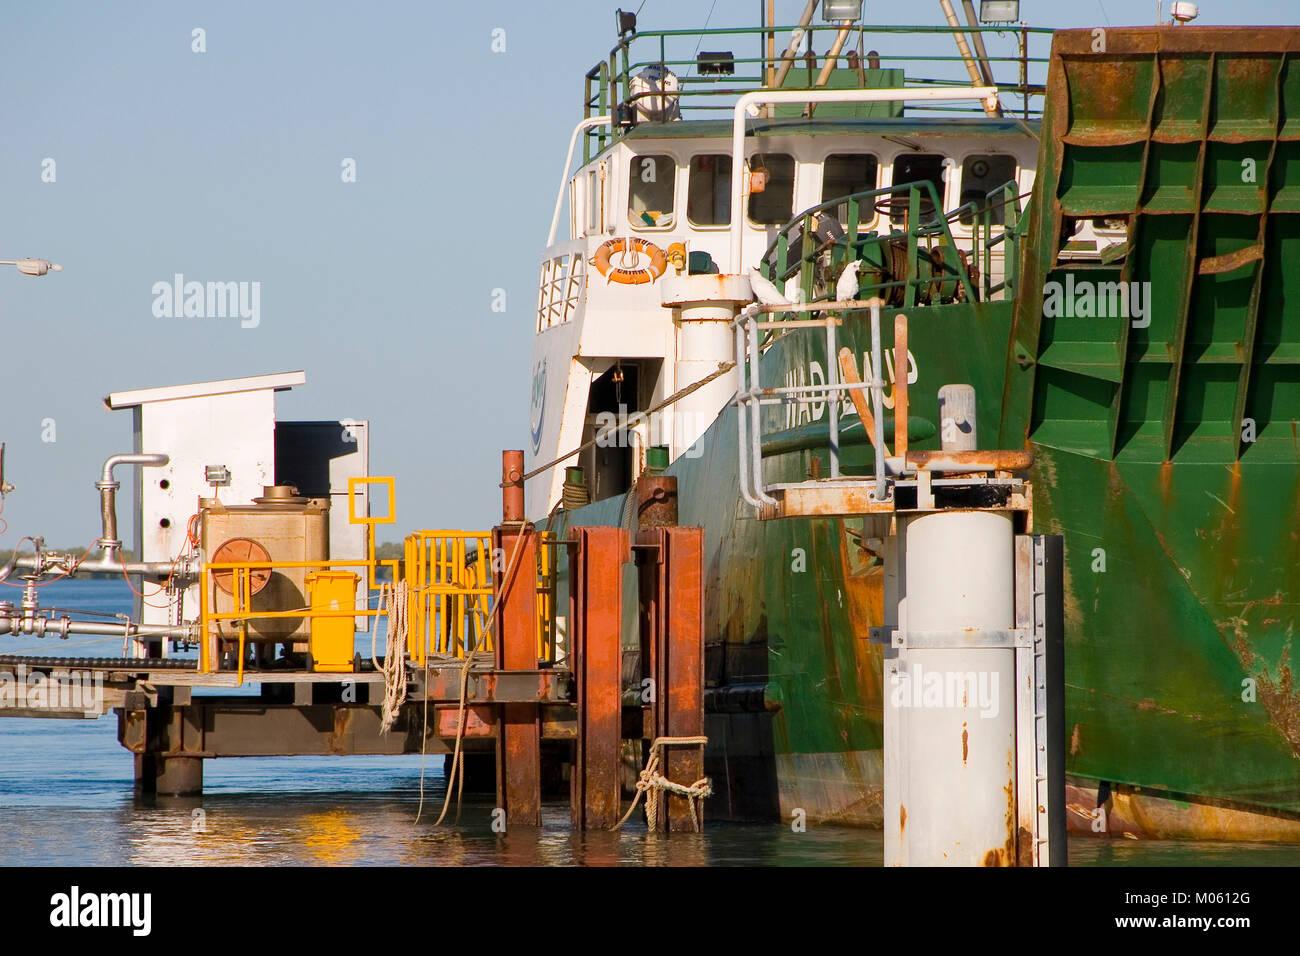 Karumba Queensland - Stock Image